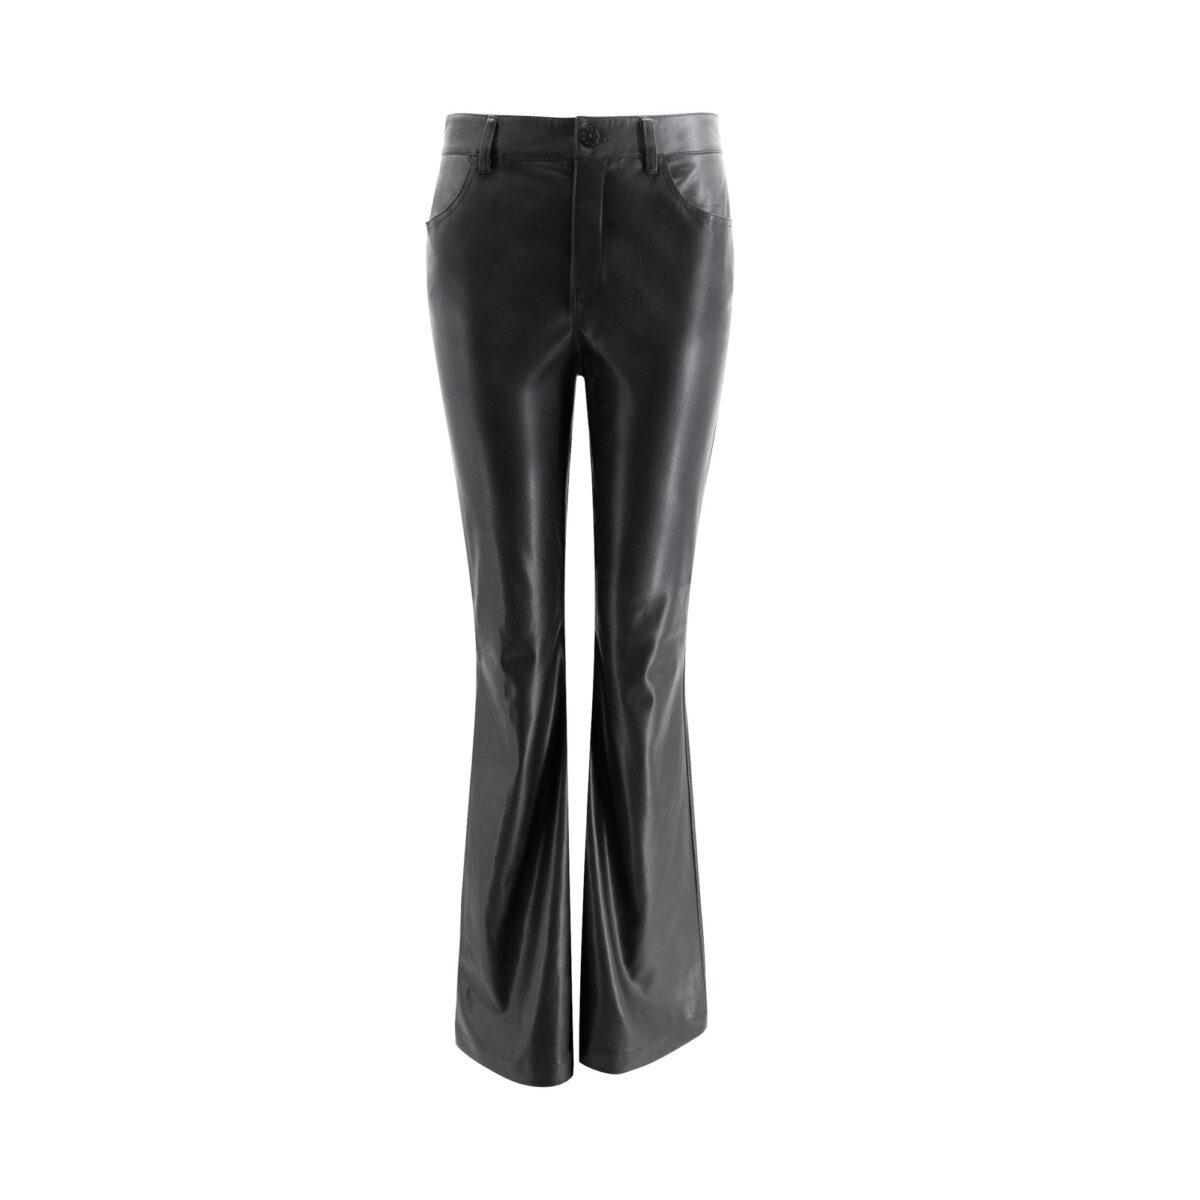 Pants Bootcut effetto pelle Nero - vista frontale | Nicla